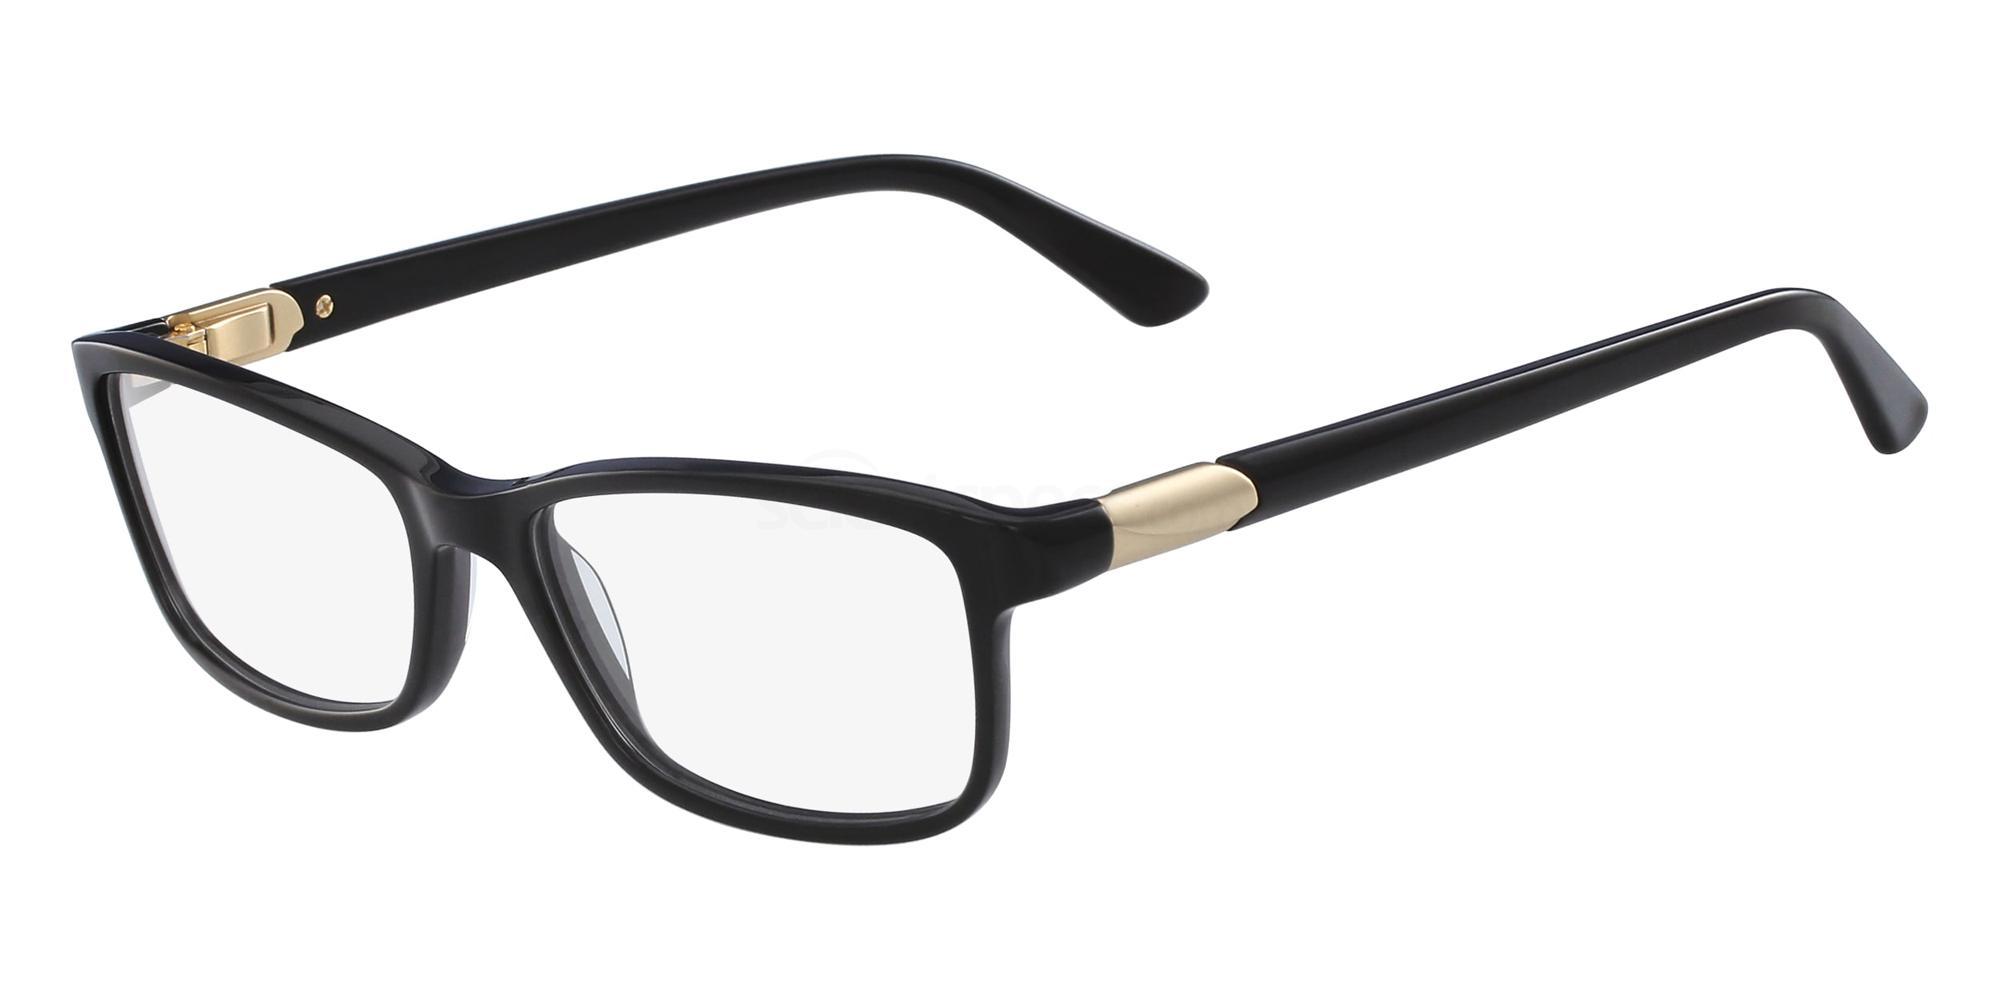 001 SK2729 GRO Glasses, Skaga